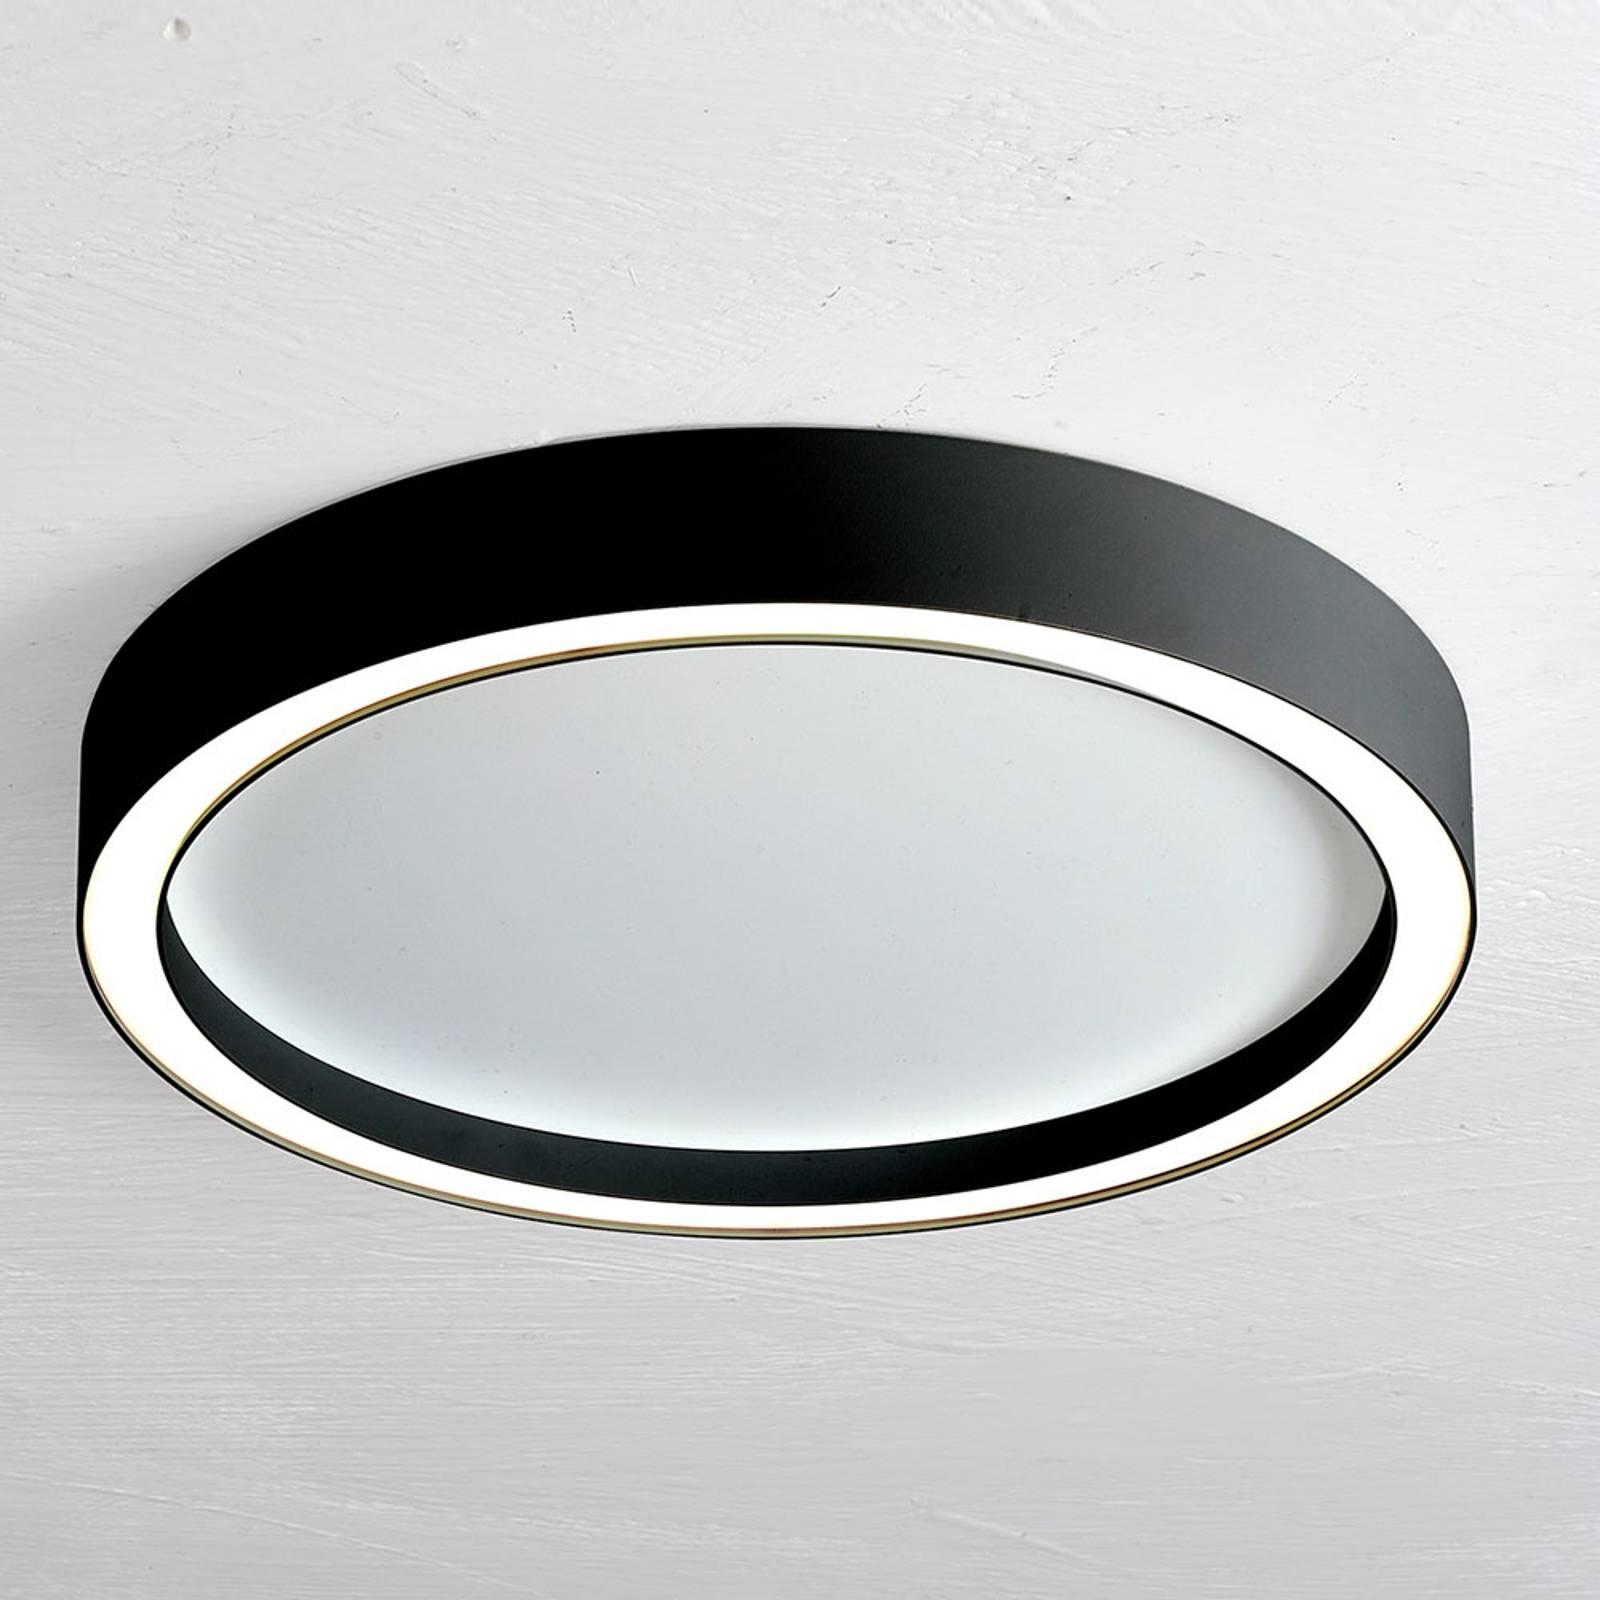 Bopp Aura lampa sufitowa LED Ø 30cm biała/czarna